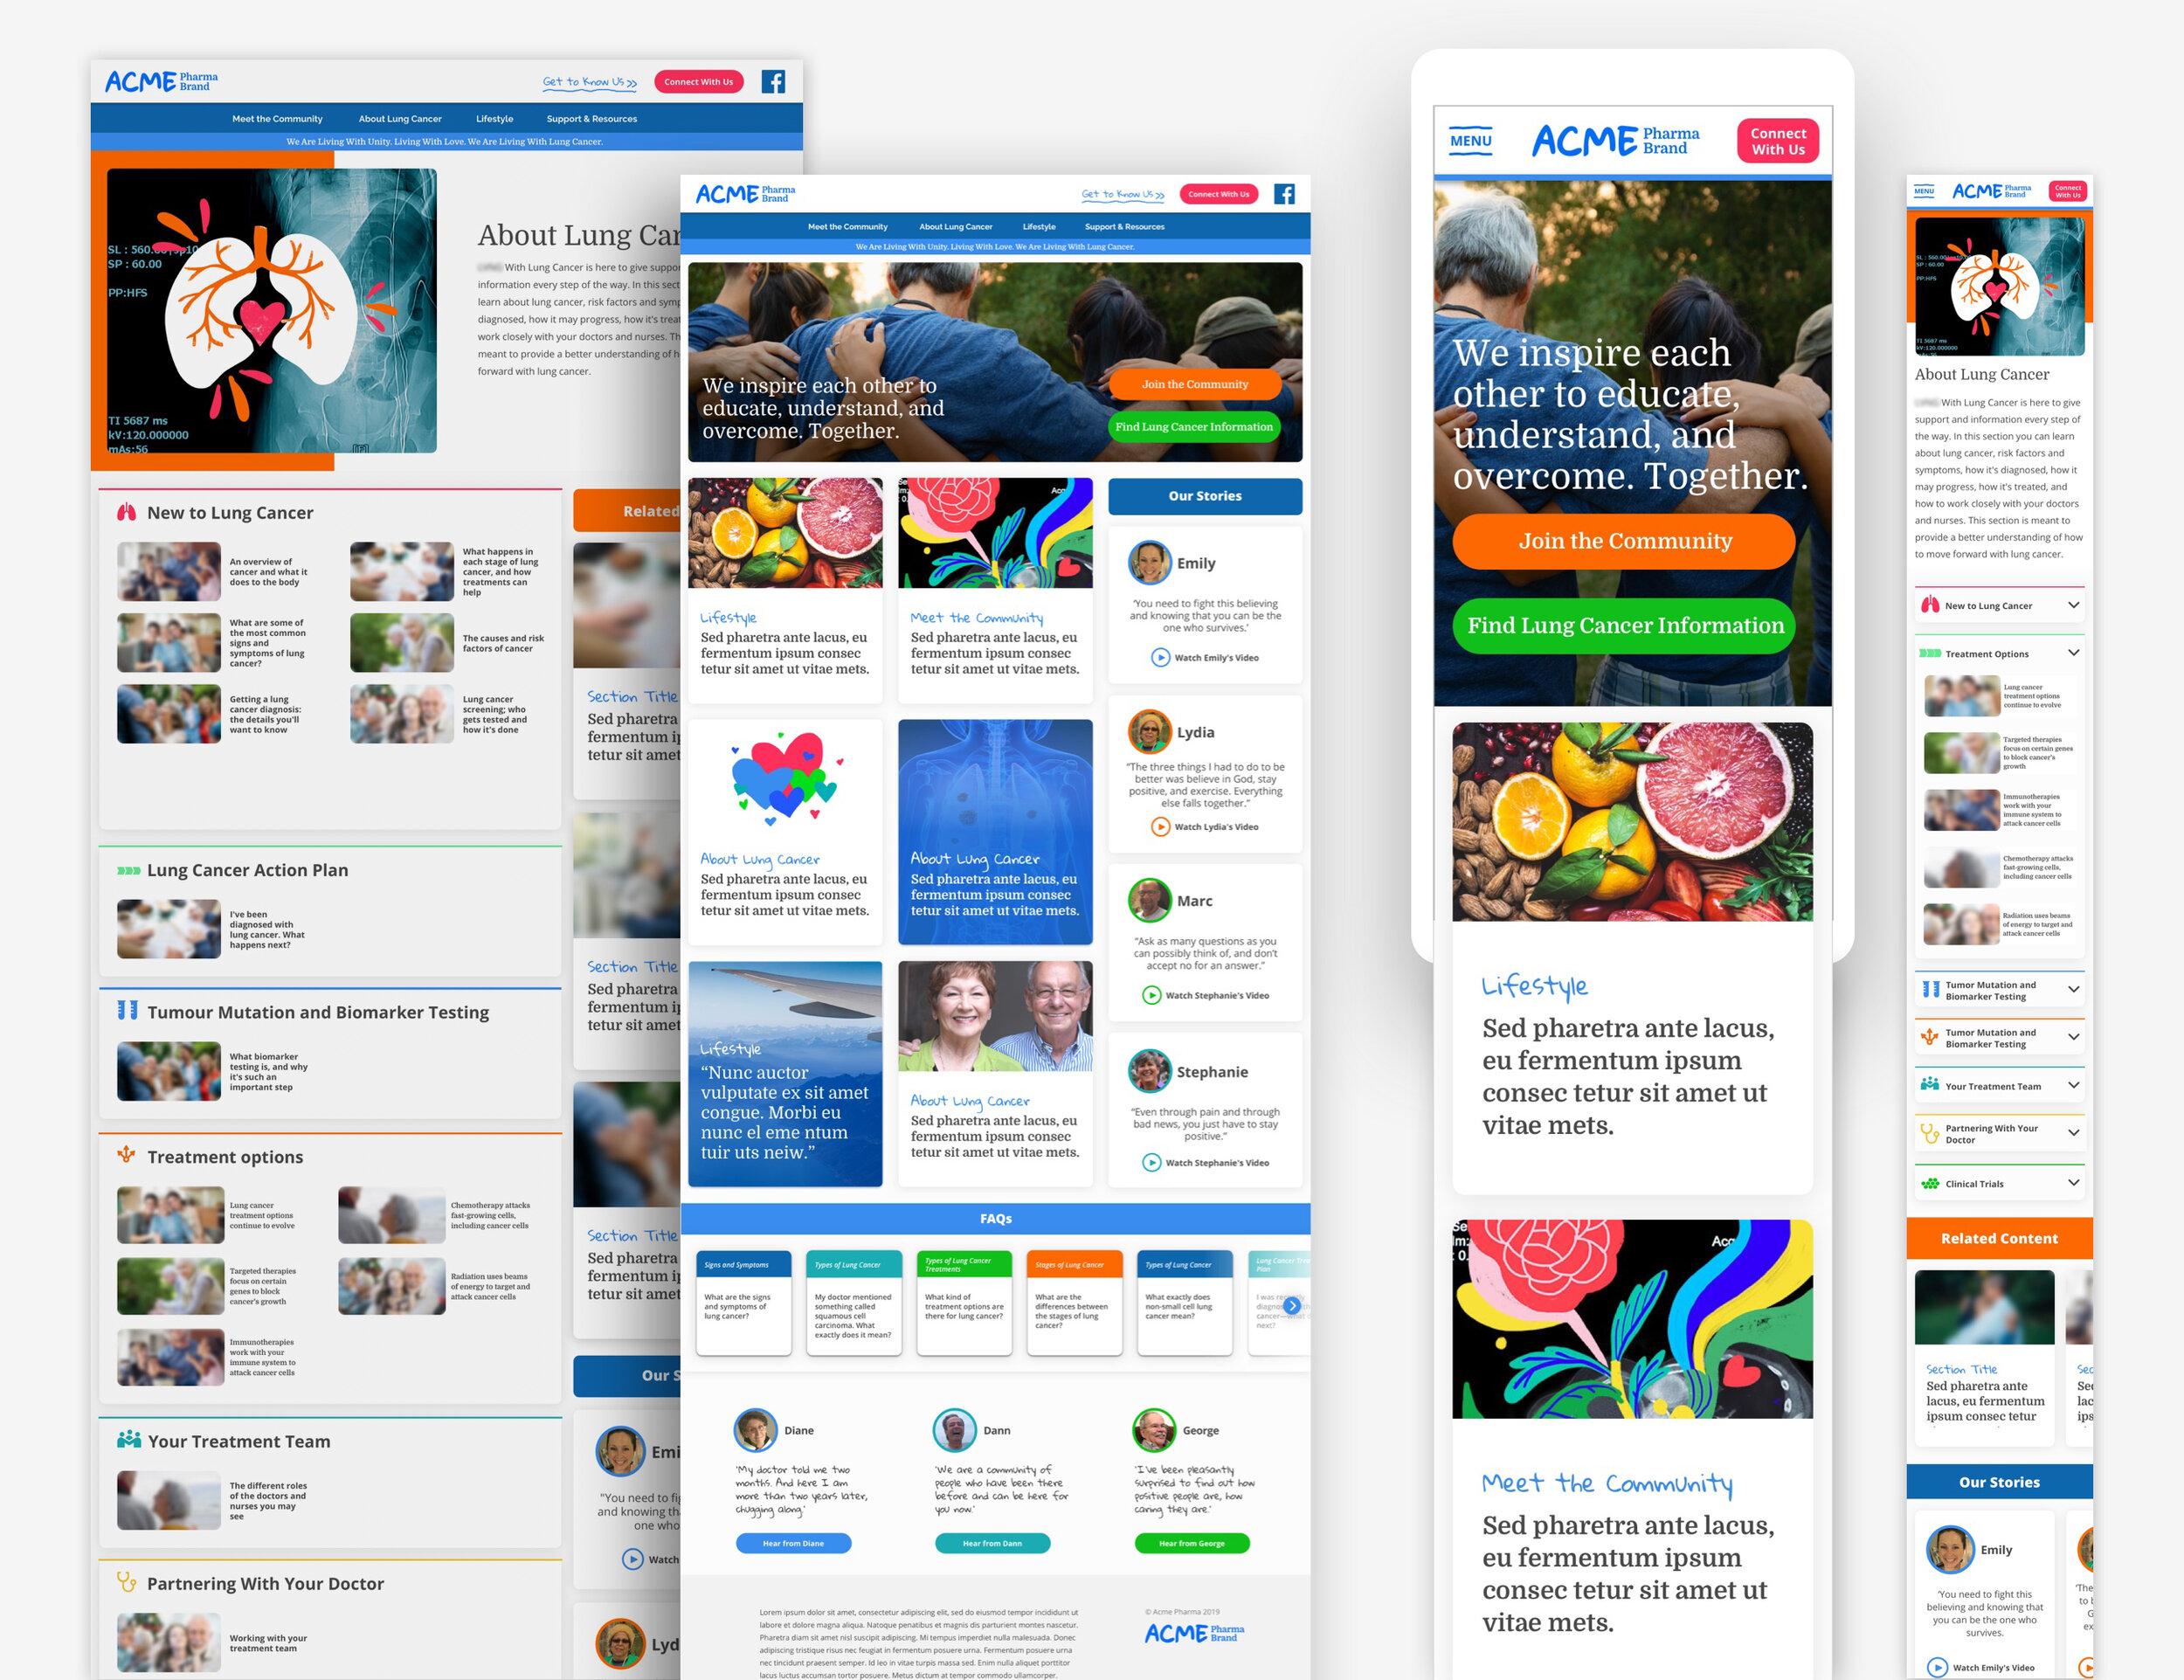 Acme_01.jpg